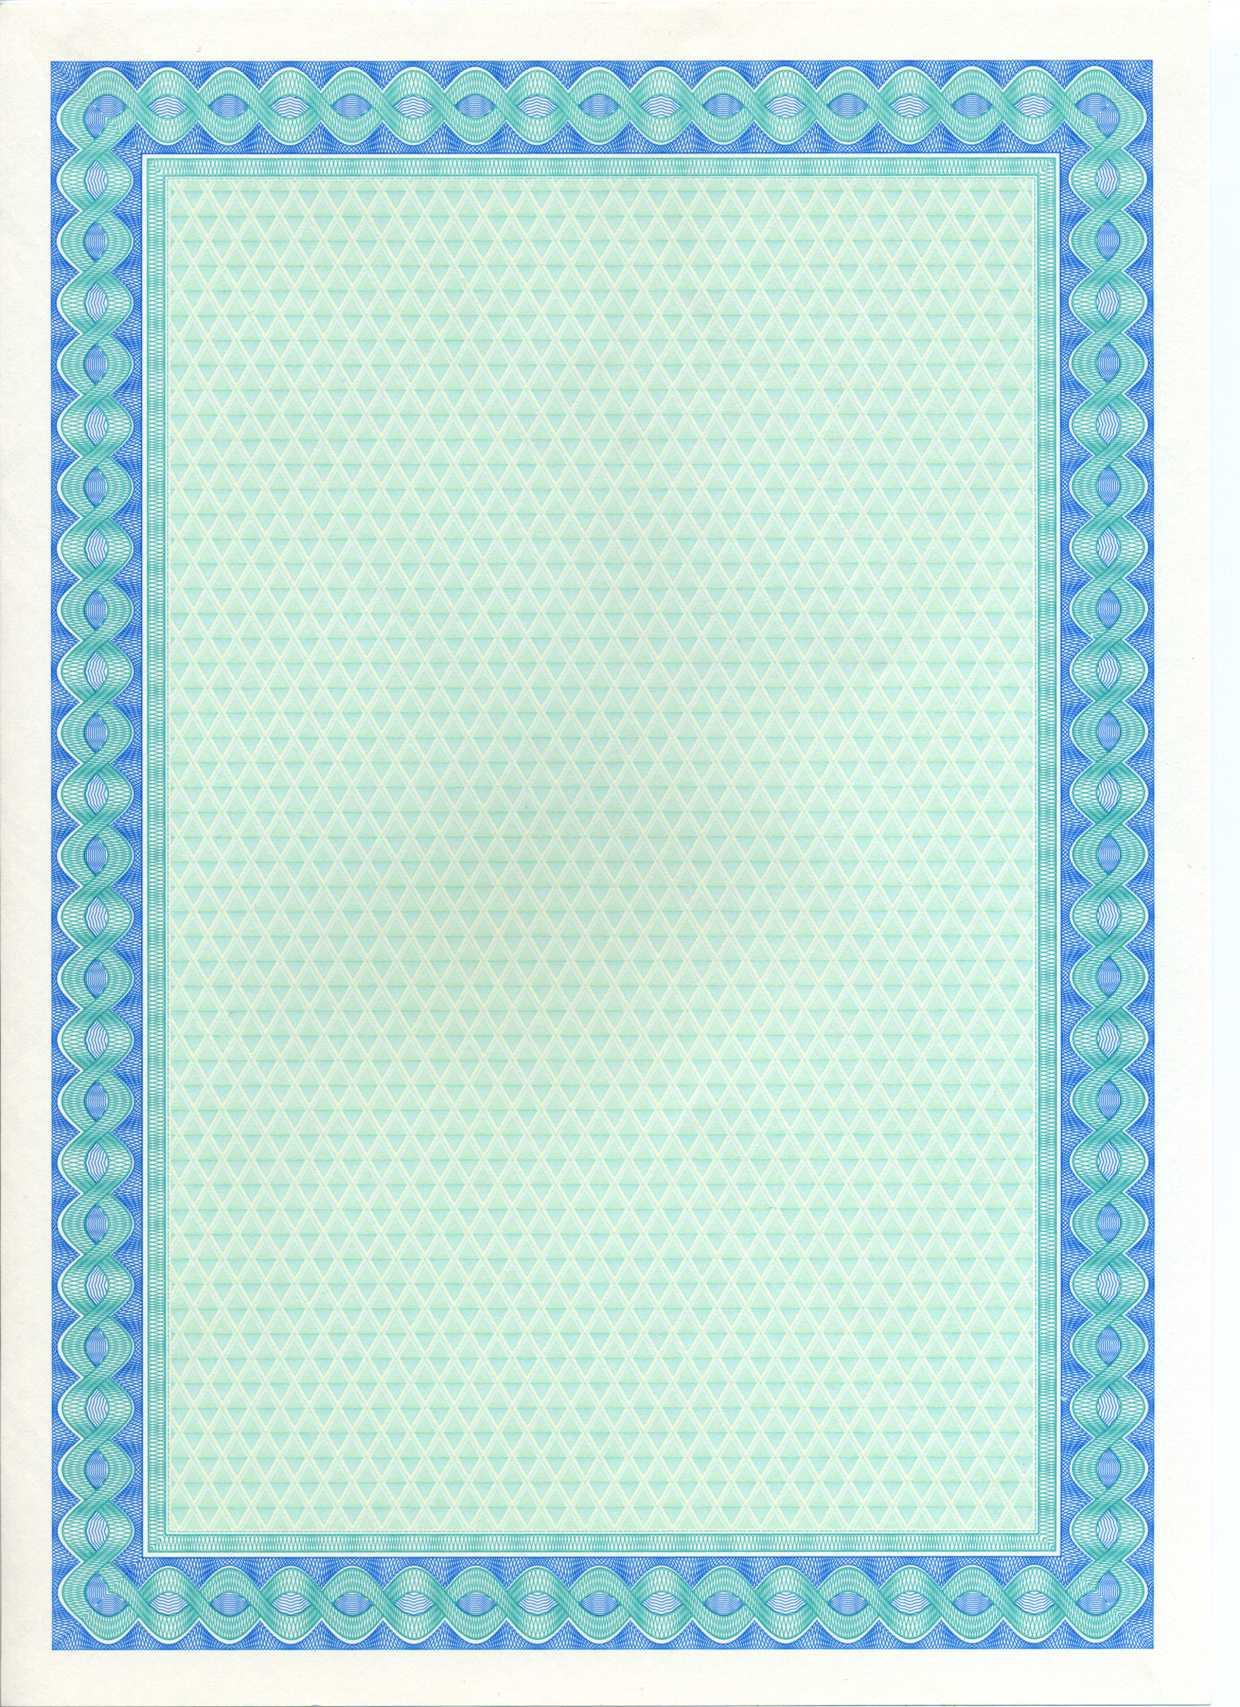 бумага с водяным знаком казахстан